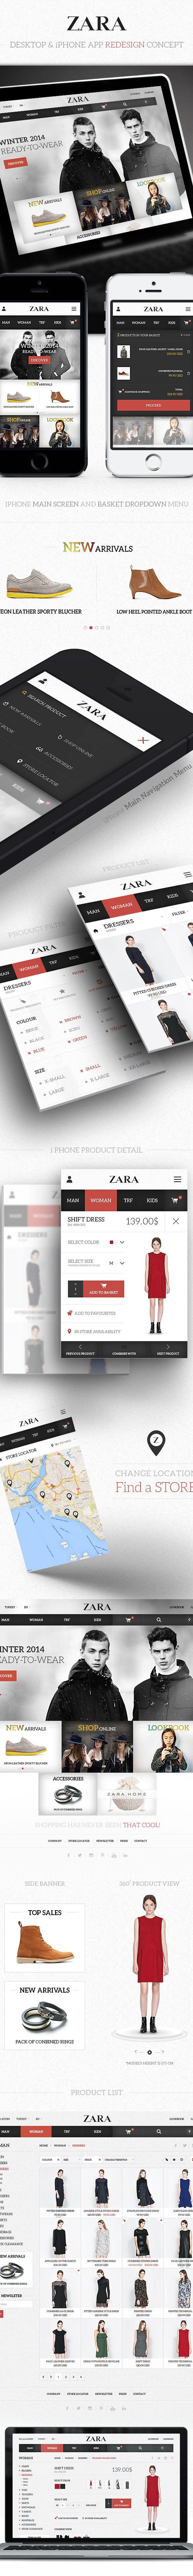 Zara / Desktop & iPhone App Redesign by Eray Demirsoy, via Behance